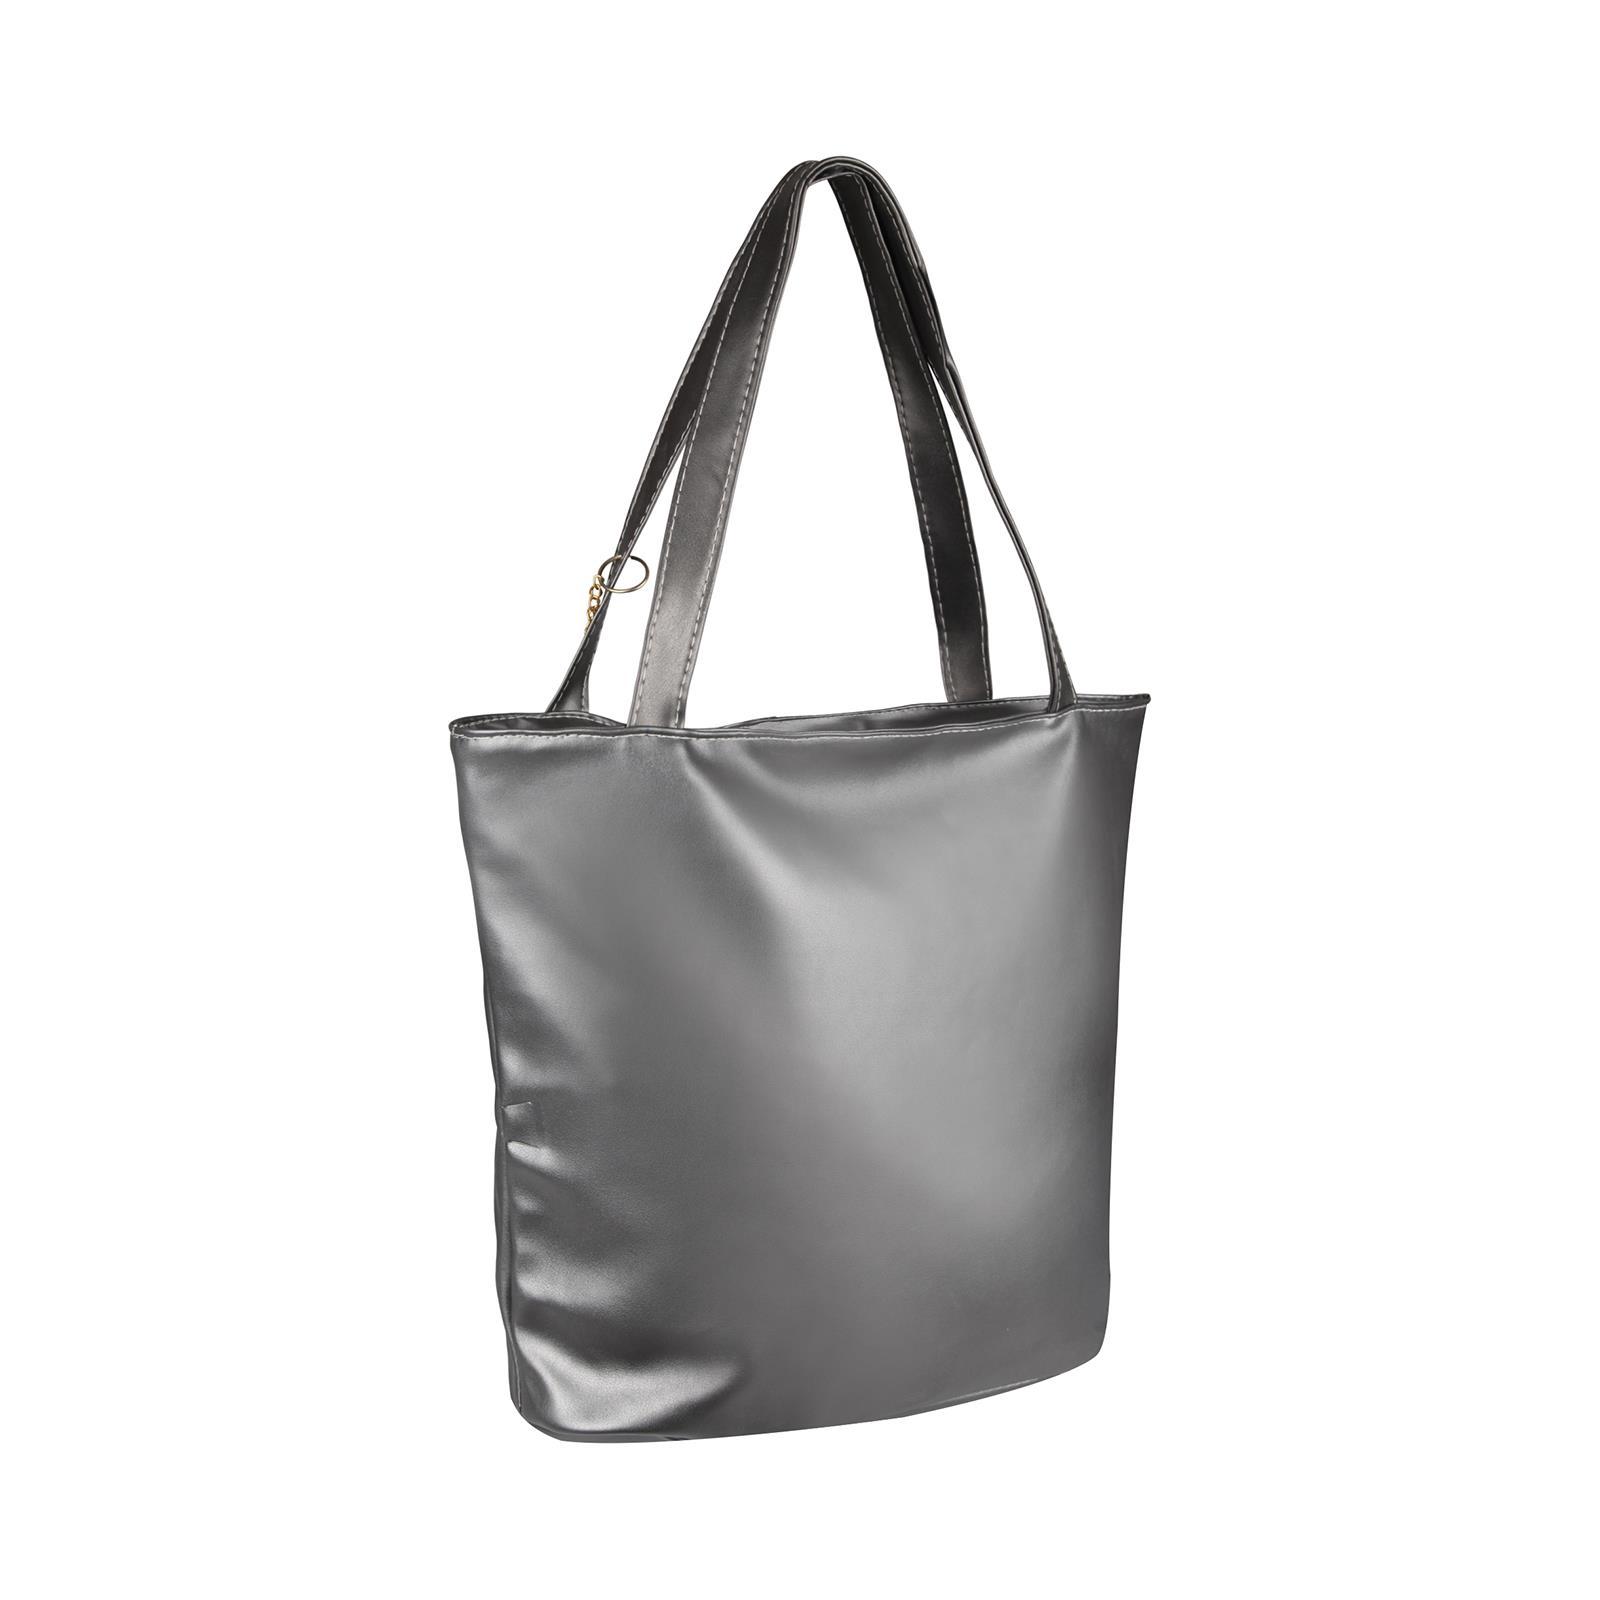 Animal-Print-Handbag-PU-Leather-Shoulder-Bag-Work-Office-Tote-Shopper-Fashion thumbnail 7